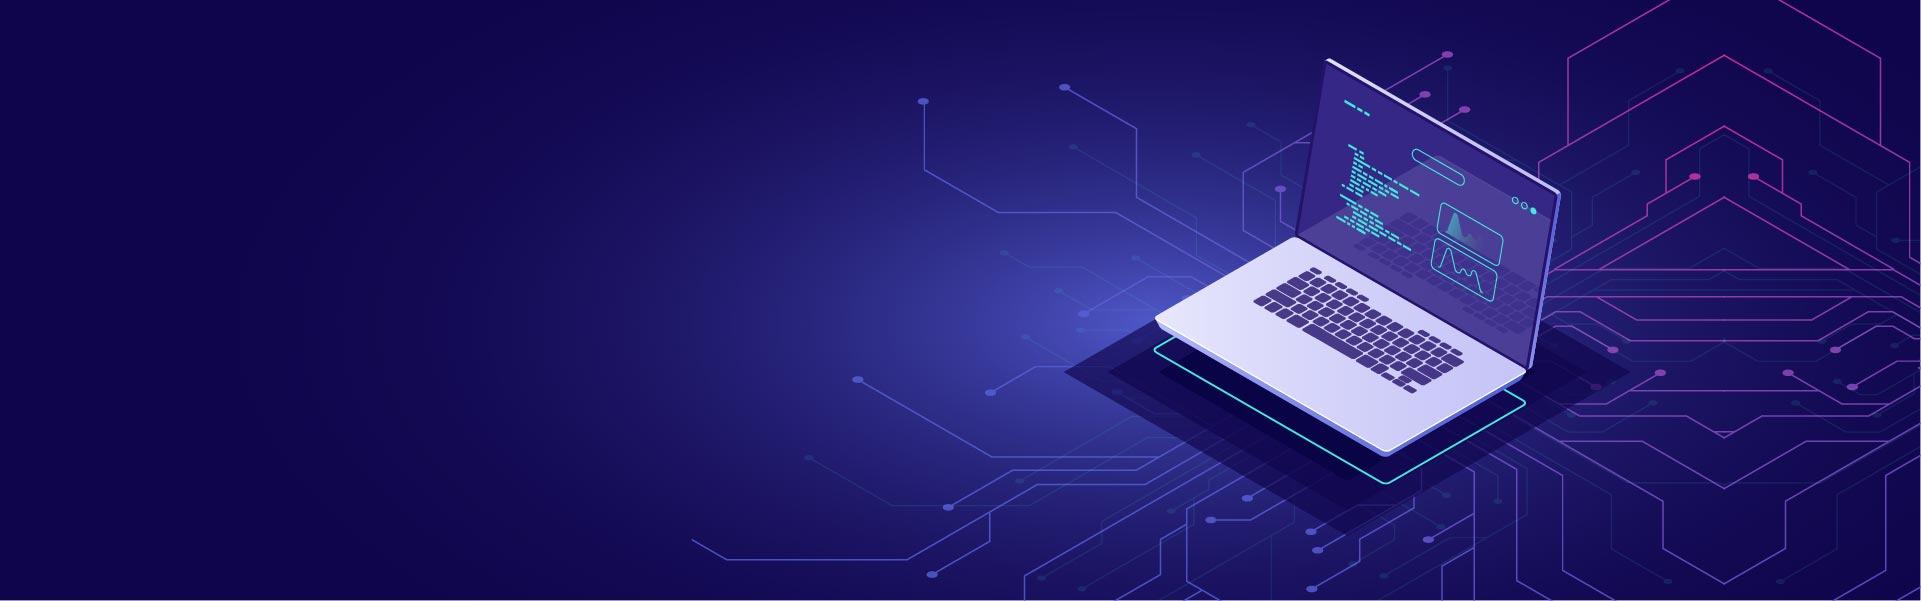 home_computer-01